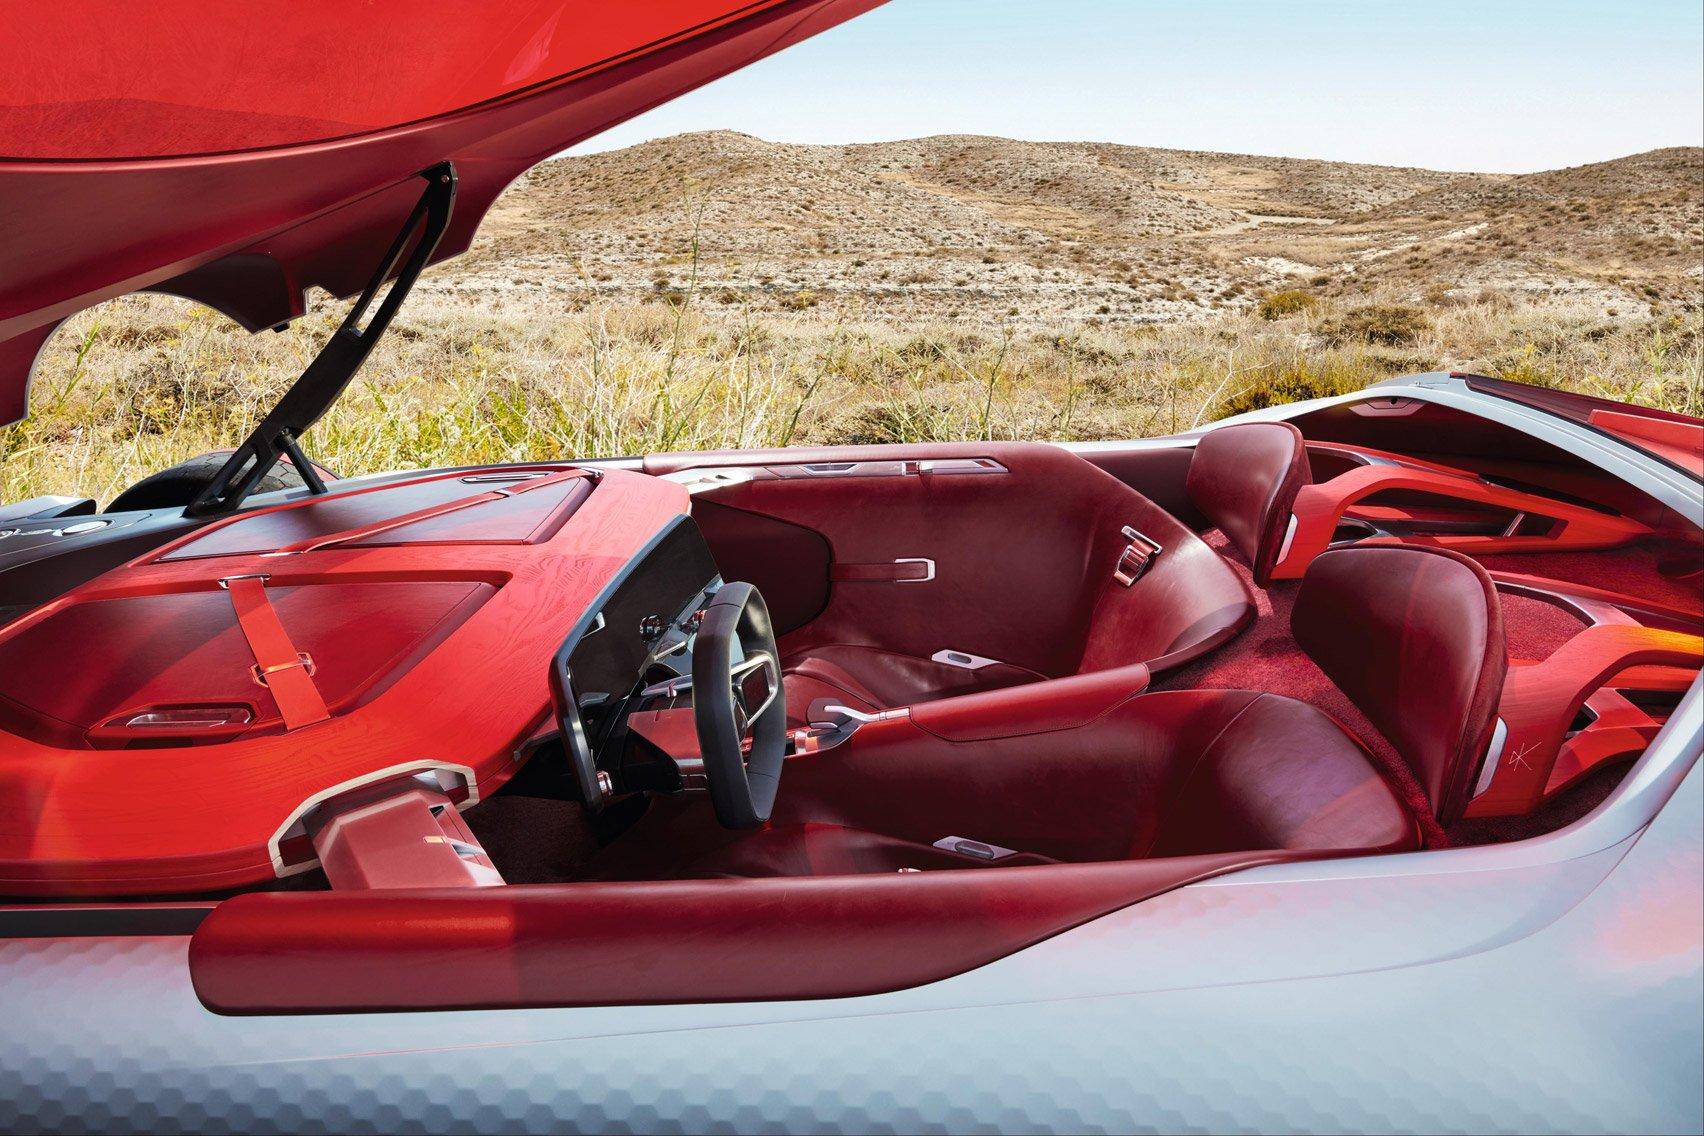 renault-trezor-concept-car-paris-motor-show_dezeen_1704_col_4